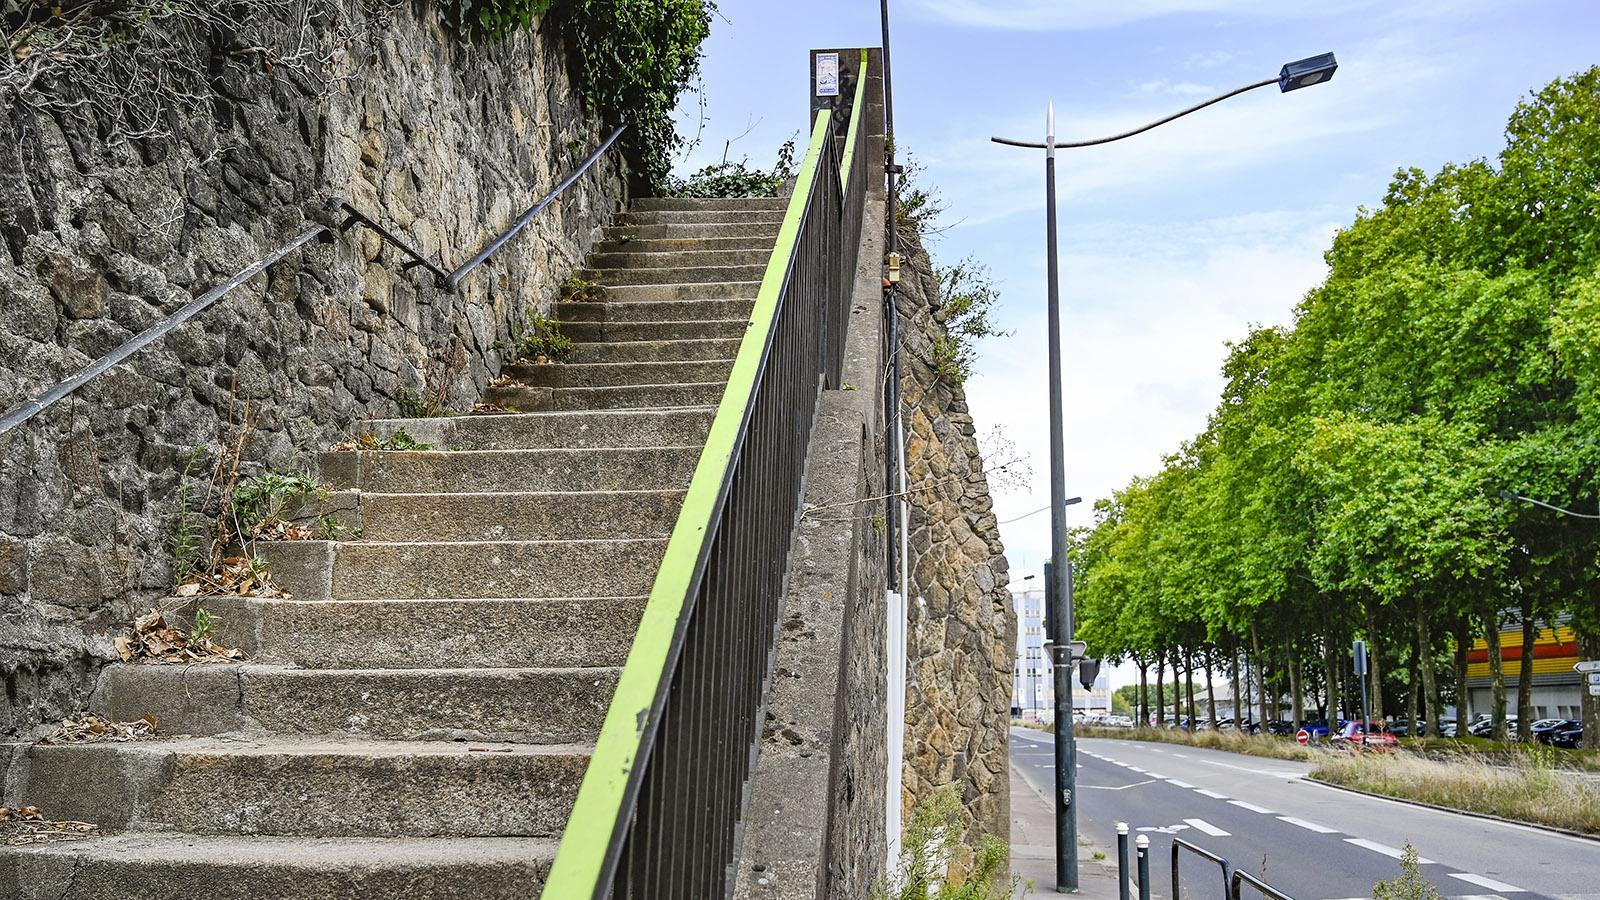 Le Voyage à Nantes: Euer Wegweiser: das grüne Band. Foto: Hilke Maunder